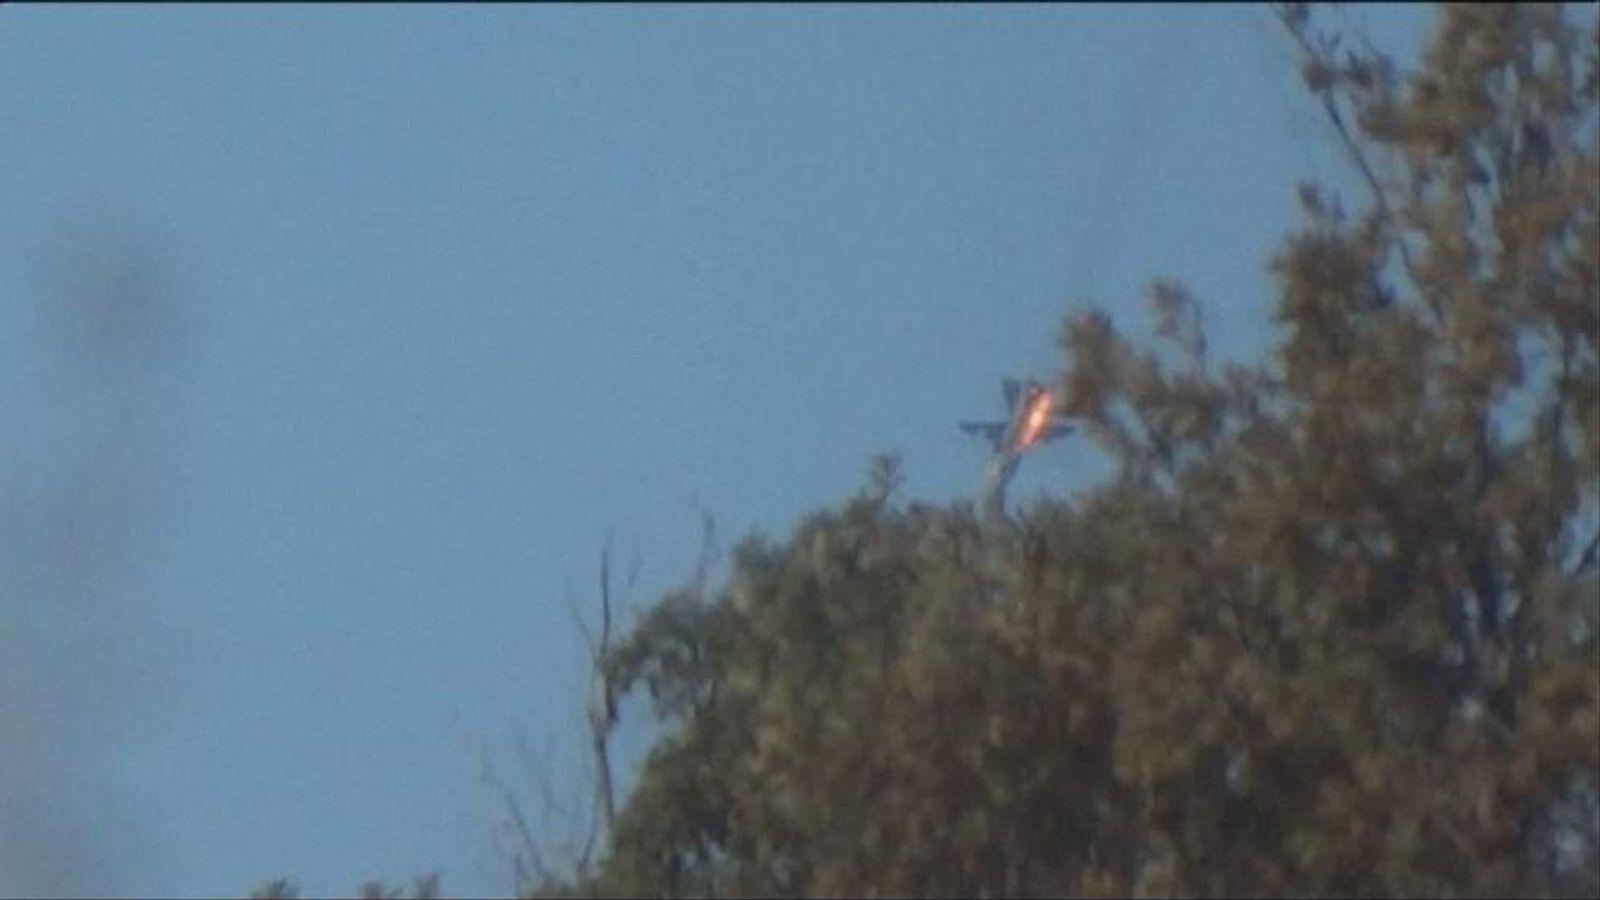 Russia Su-24 jet shot down by Turkey F-16 fighters near Syria border